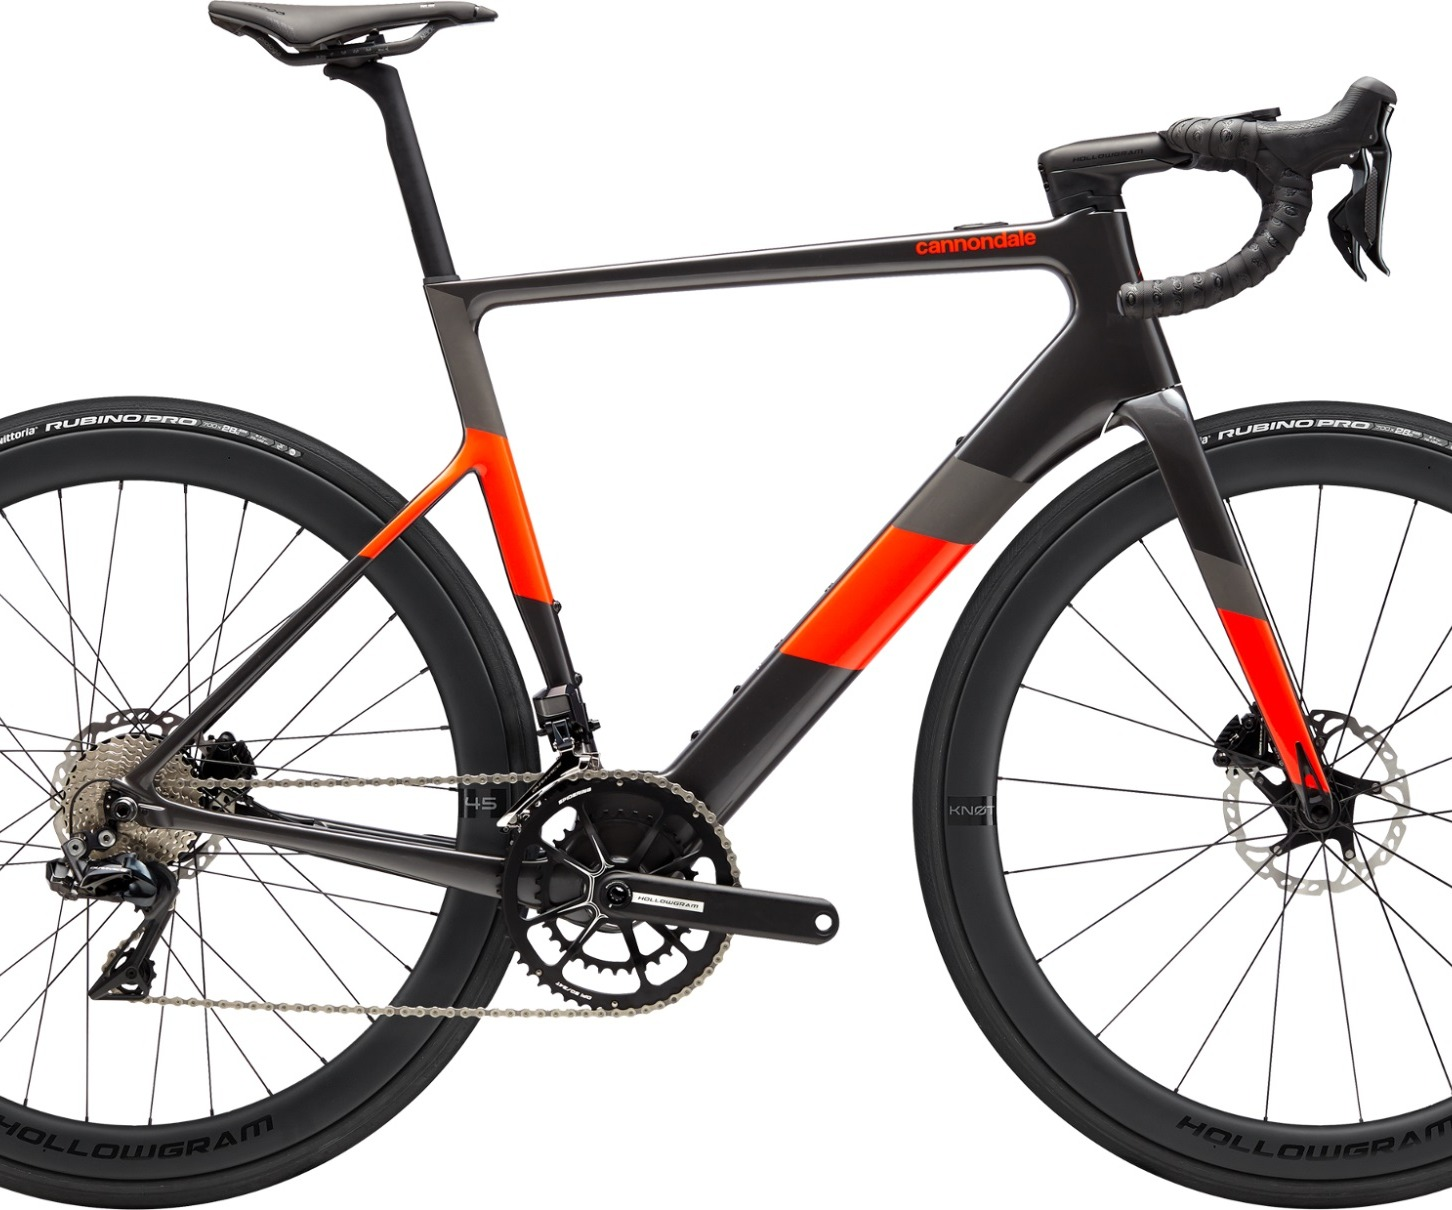 Cannondale E-Road Bikes